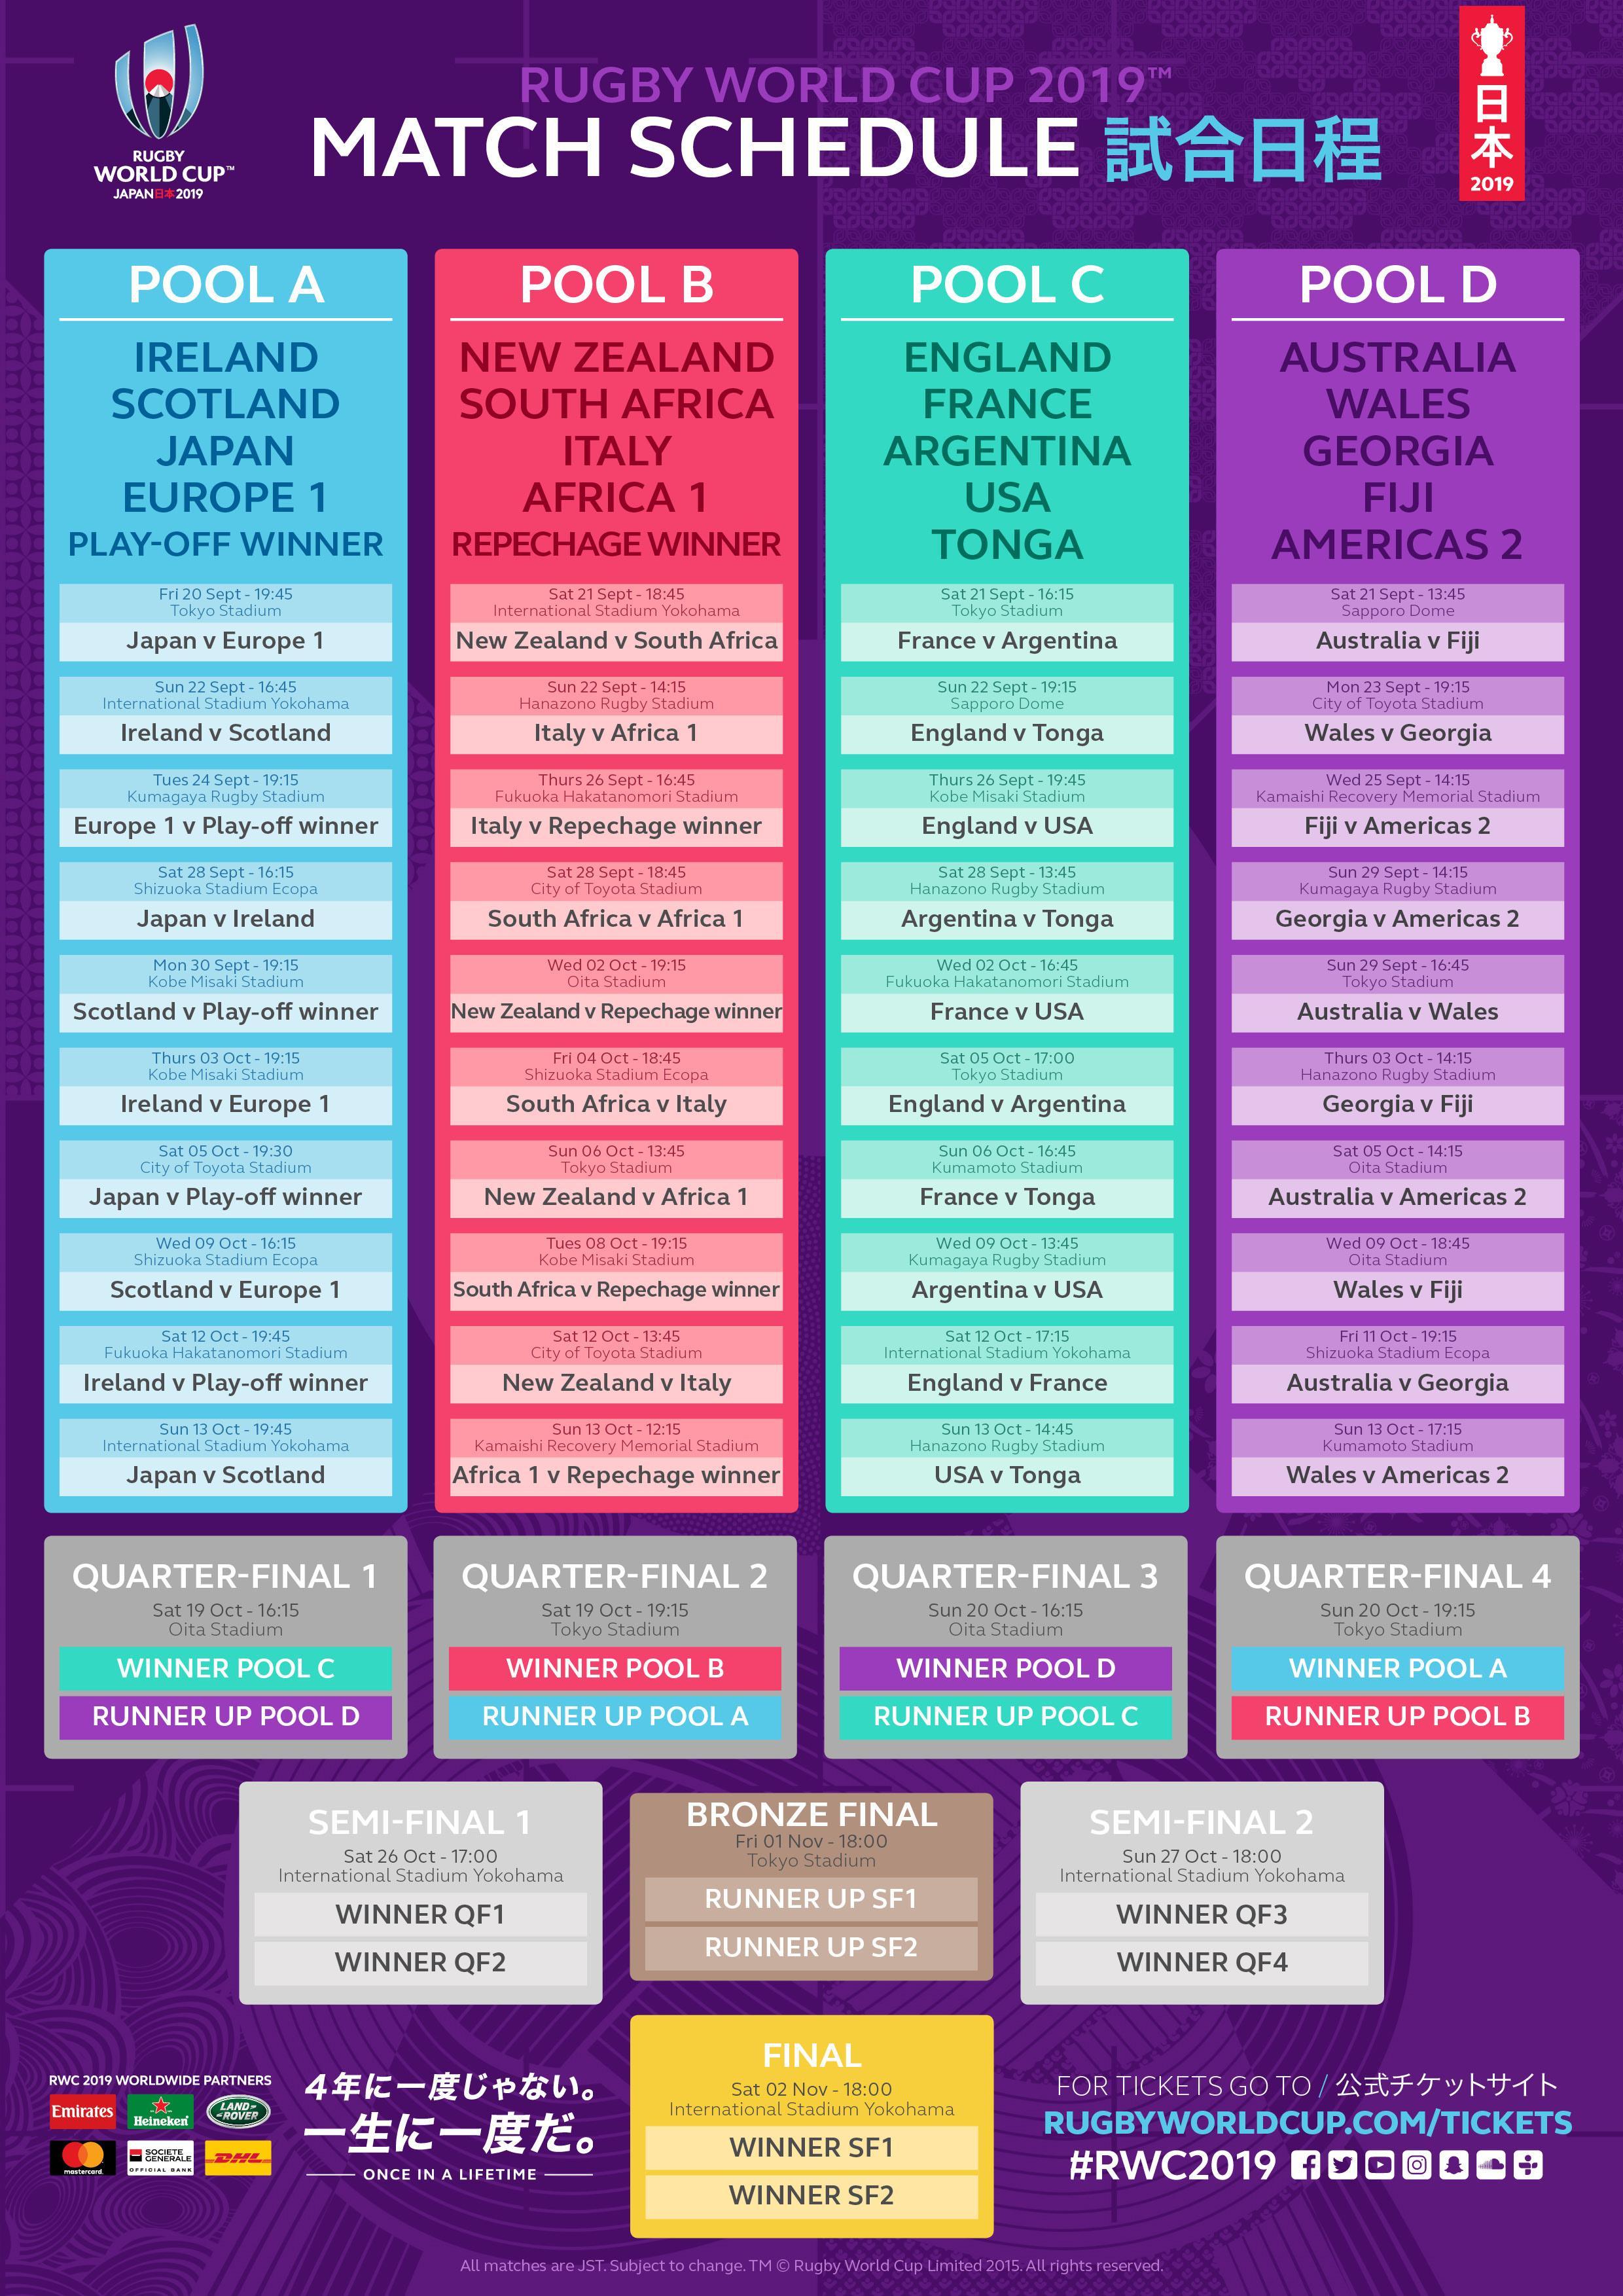 RWC2019_Match-Schedule-Pool.jpg